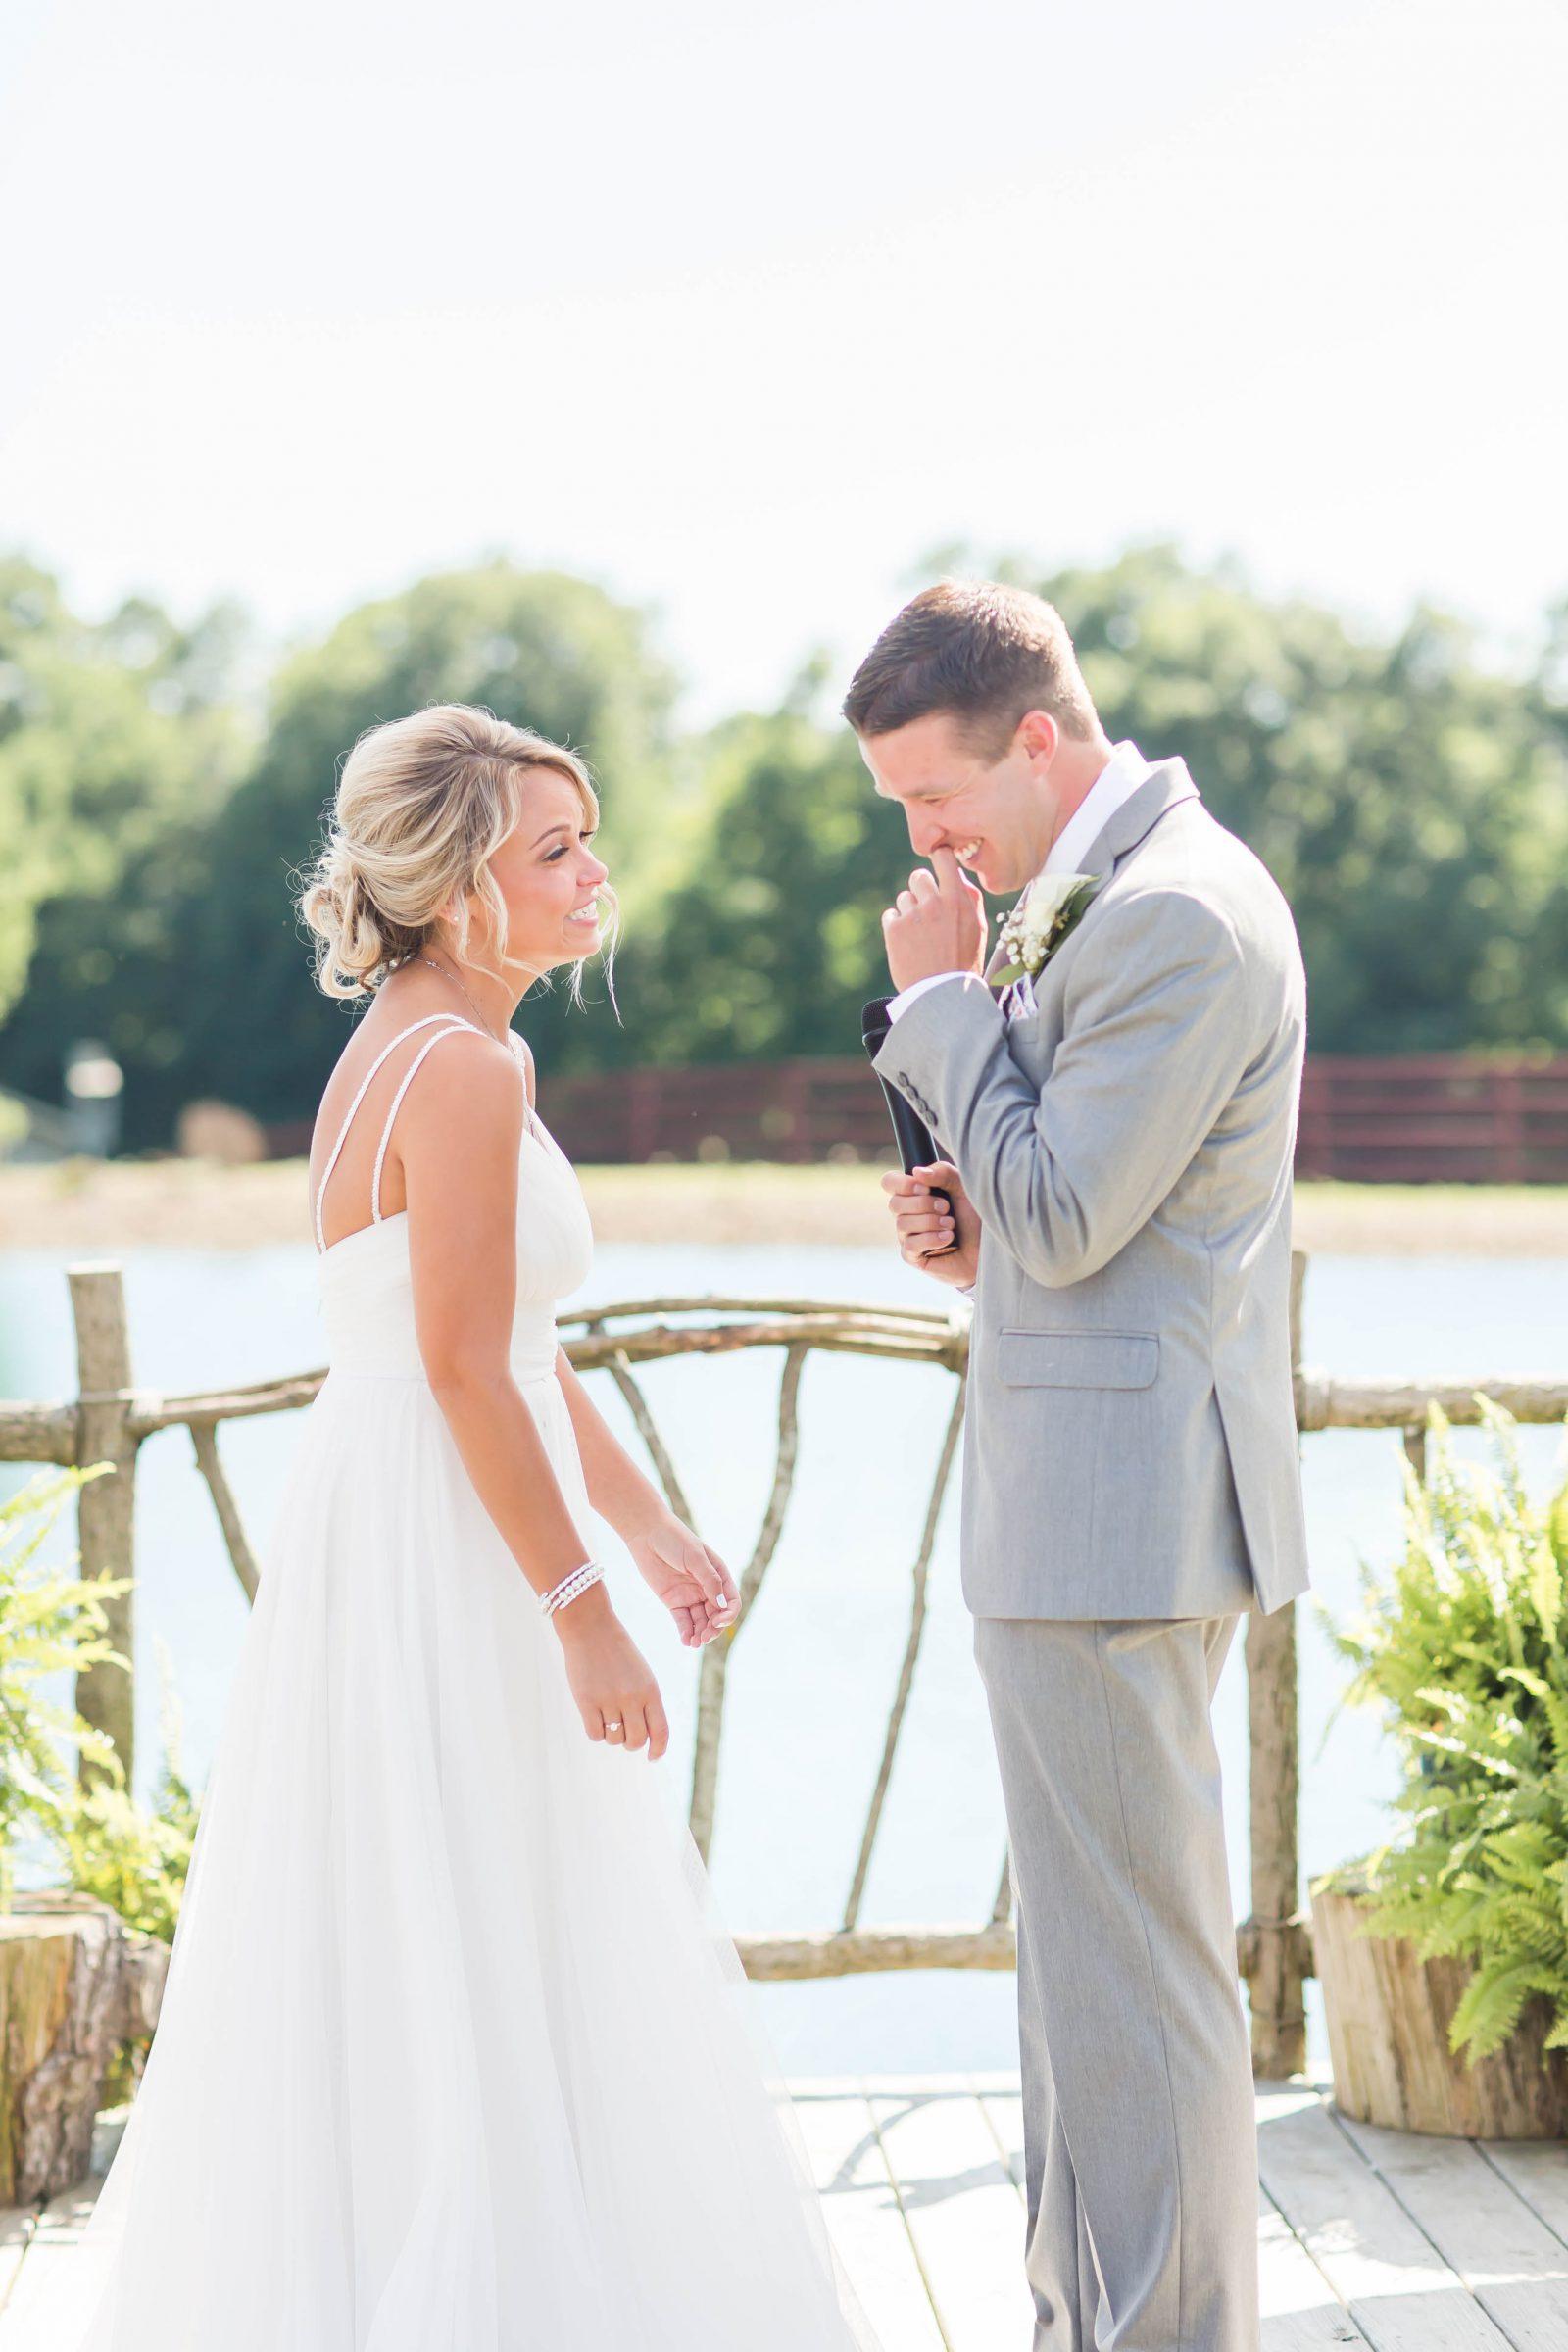 peacock-ridge-summer-wedding-photographer-akron-ohio-loren-jackson-photography-78